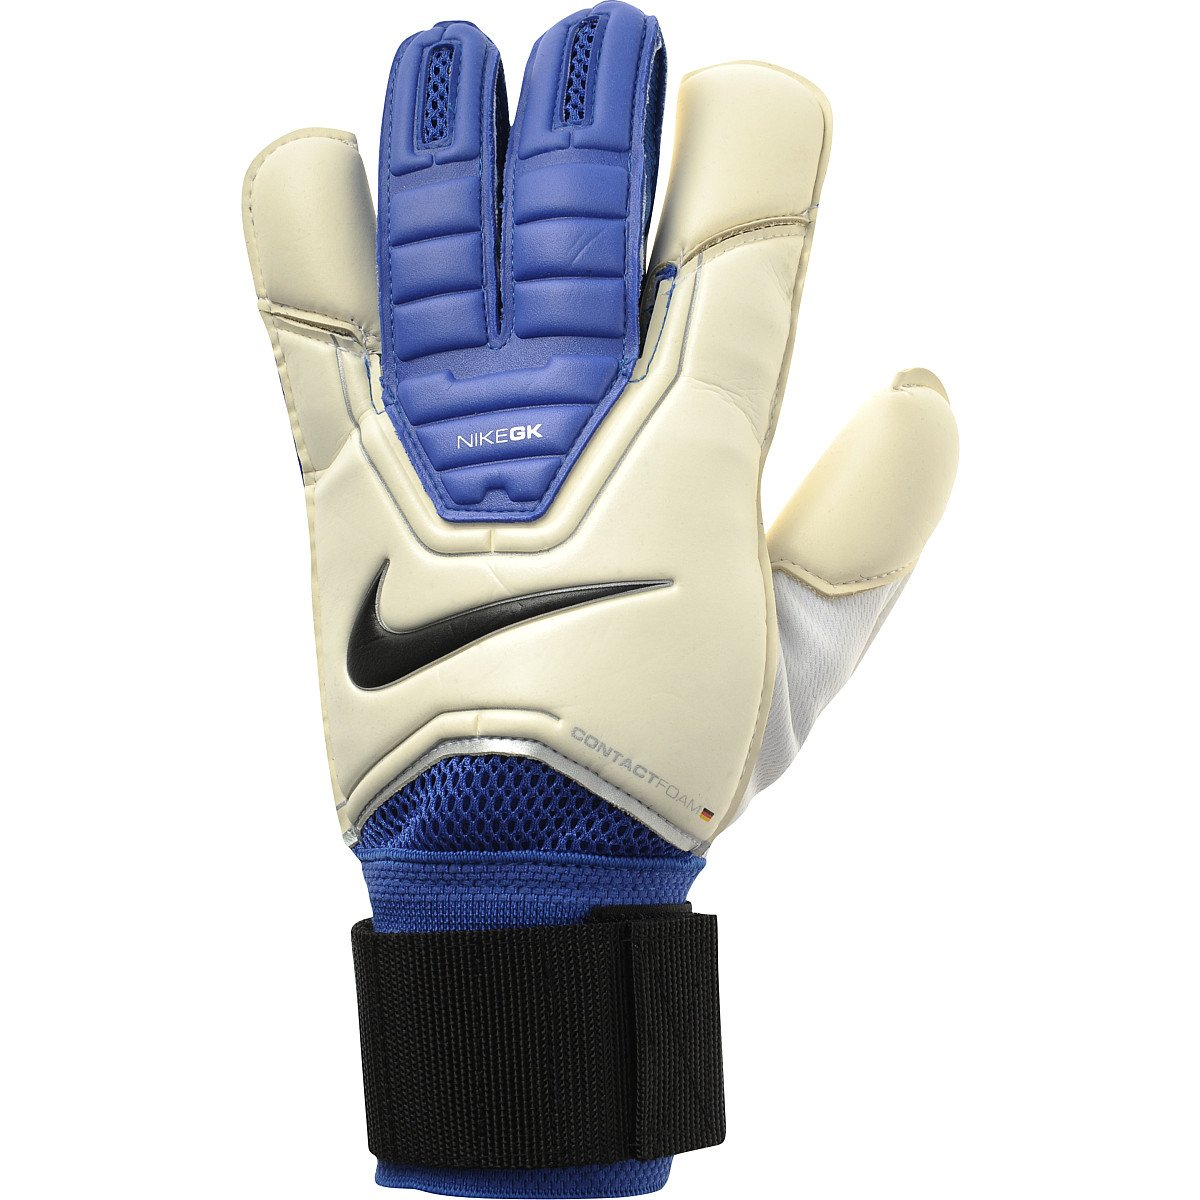 Nike Nike GK Vapor GRIP 3, Größe Nike US 7